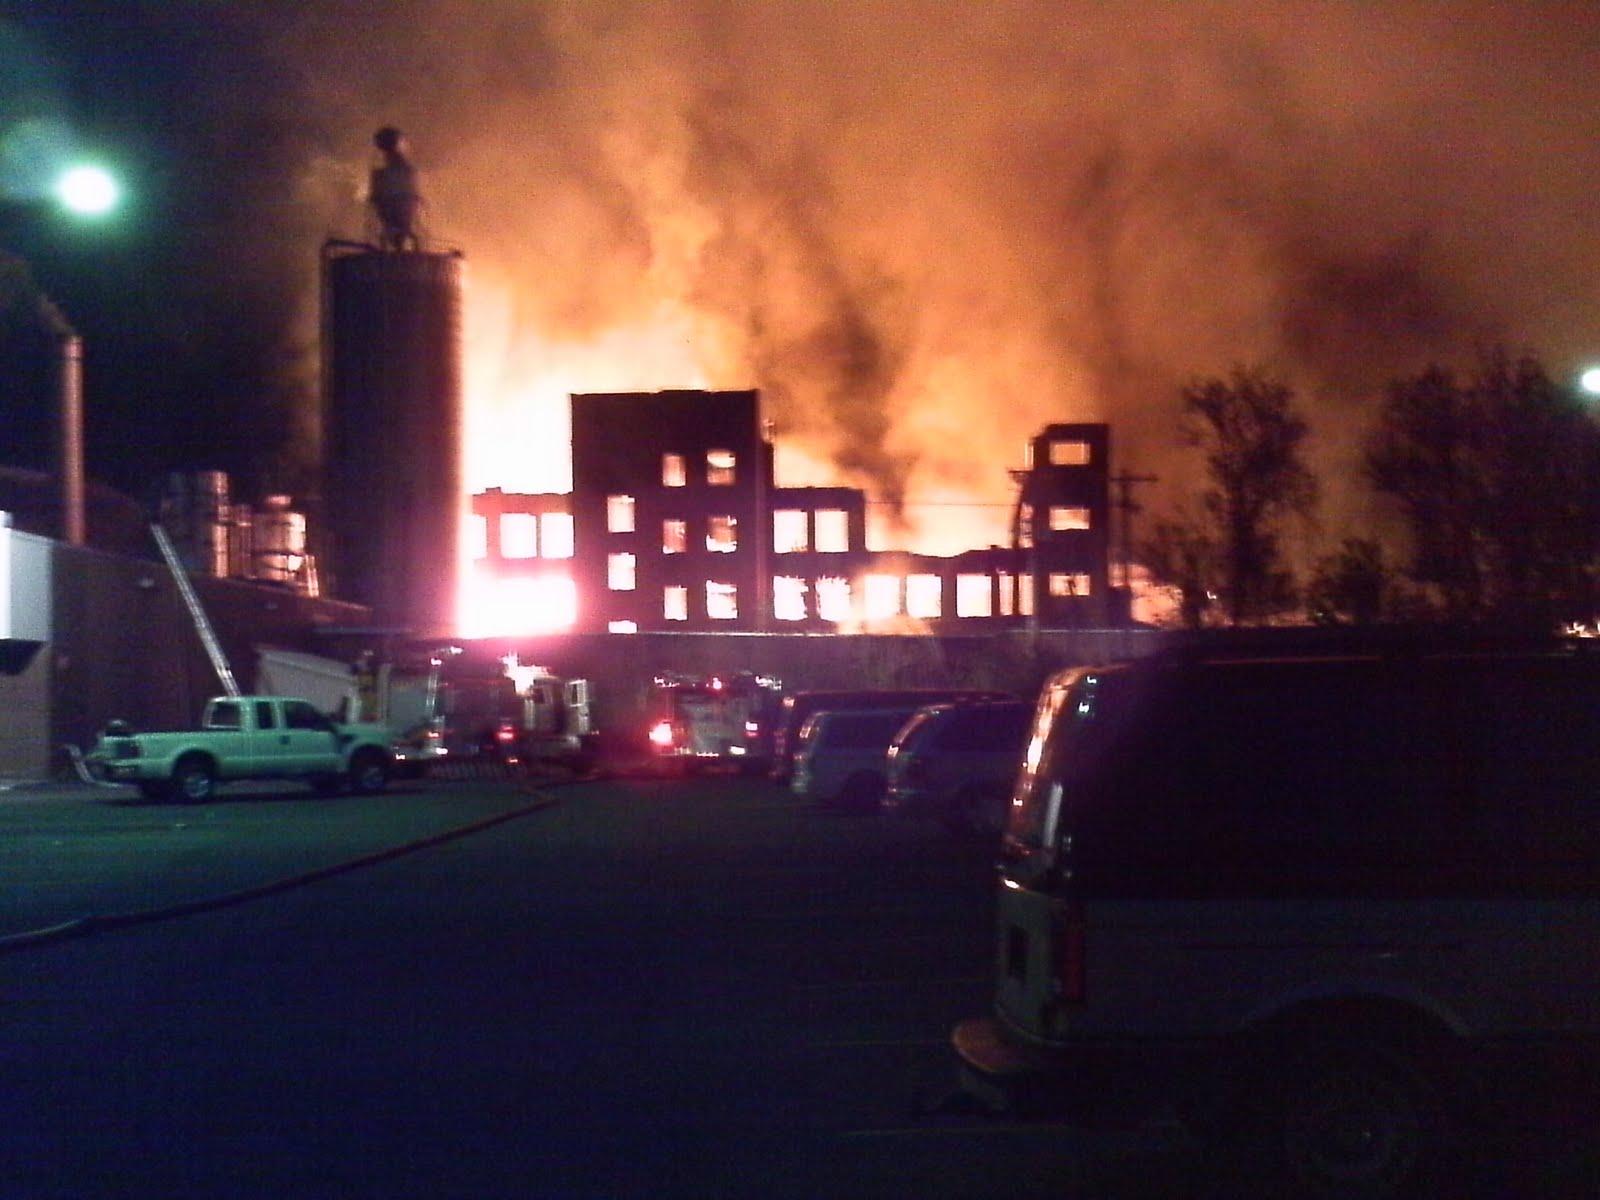 http://3.bp.blogspot.com/_Ah1YLDg8Hfg/S-TIuO40z8I/AAAAAAAAORY/uRi9ur1toSc/s1600/IMAG0064+salamanca+fire+5.jpg